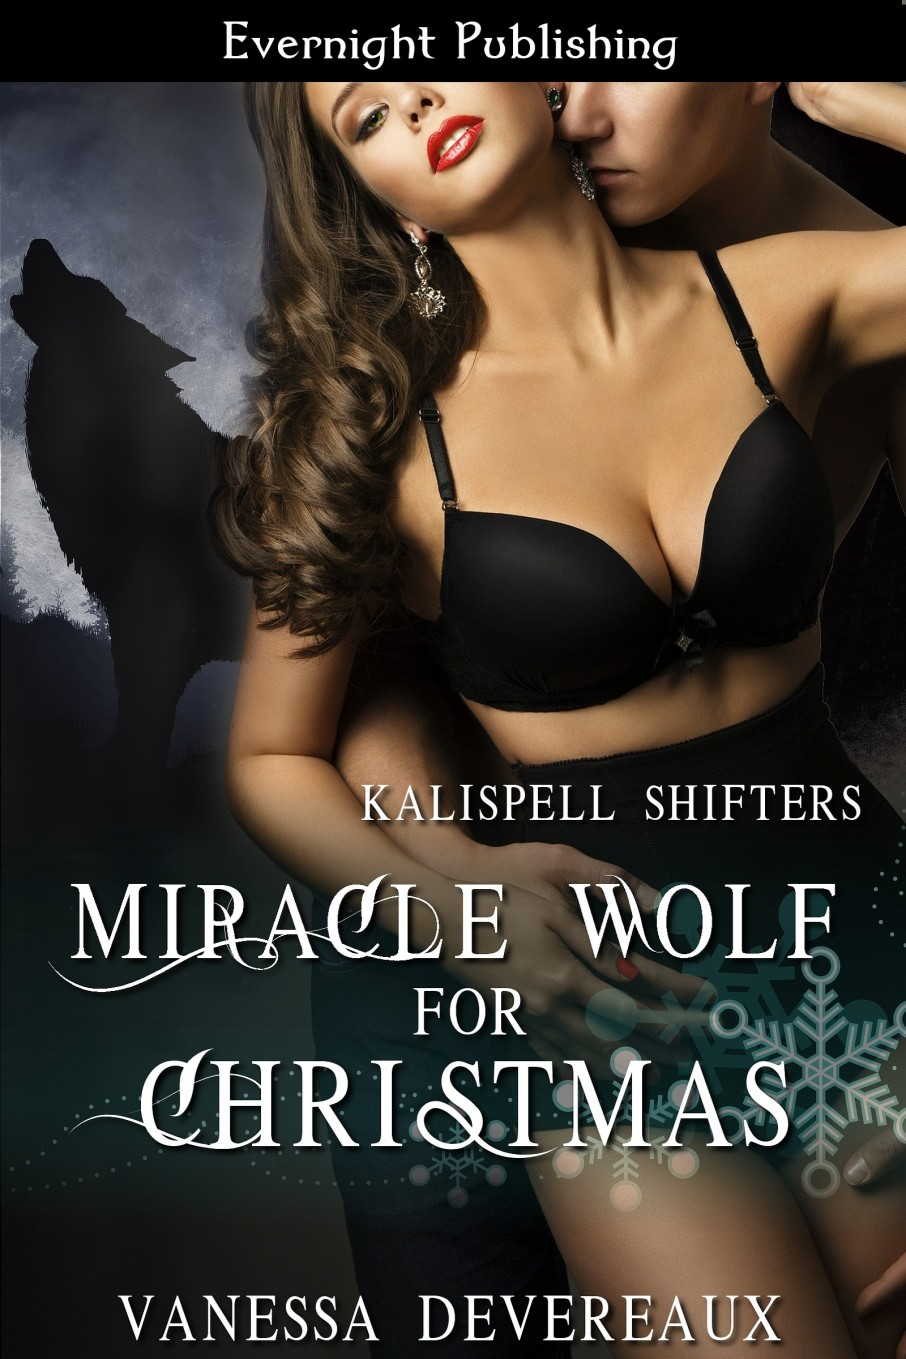 miraclewolfforchristmas1l.jpg